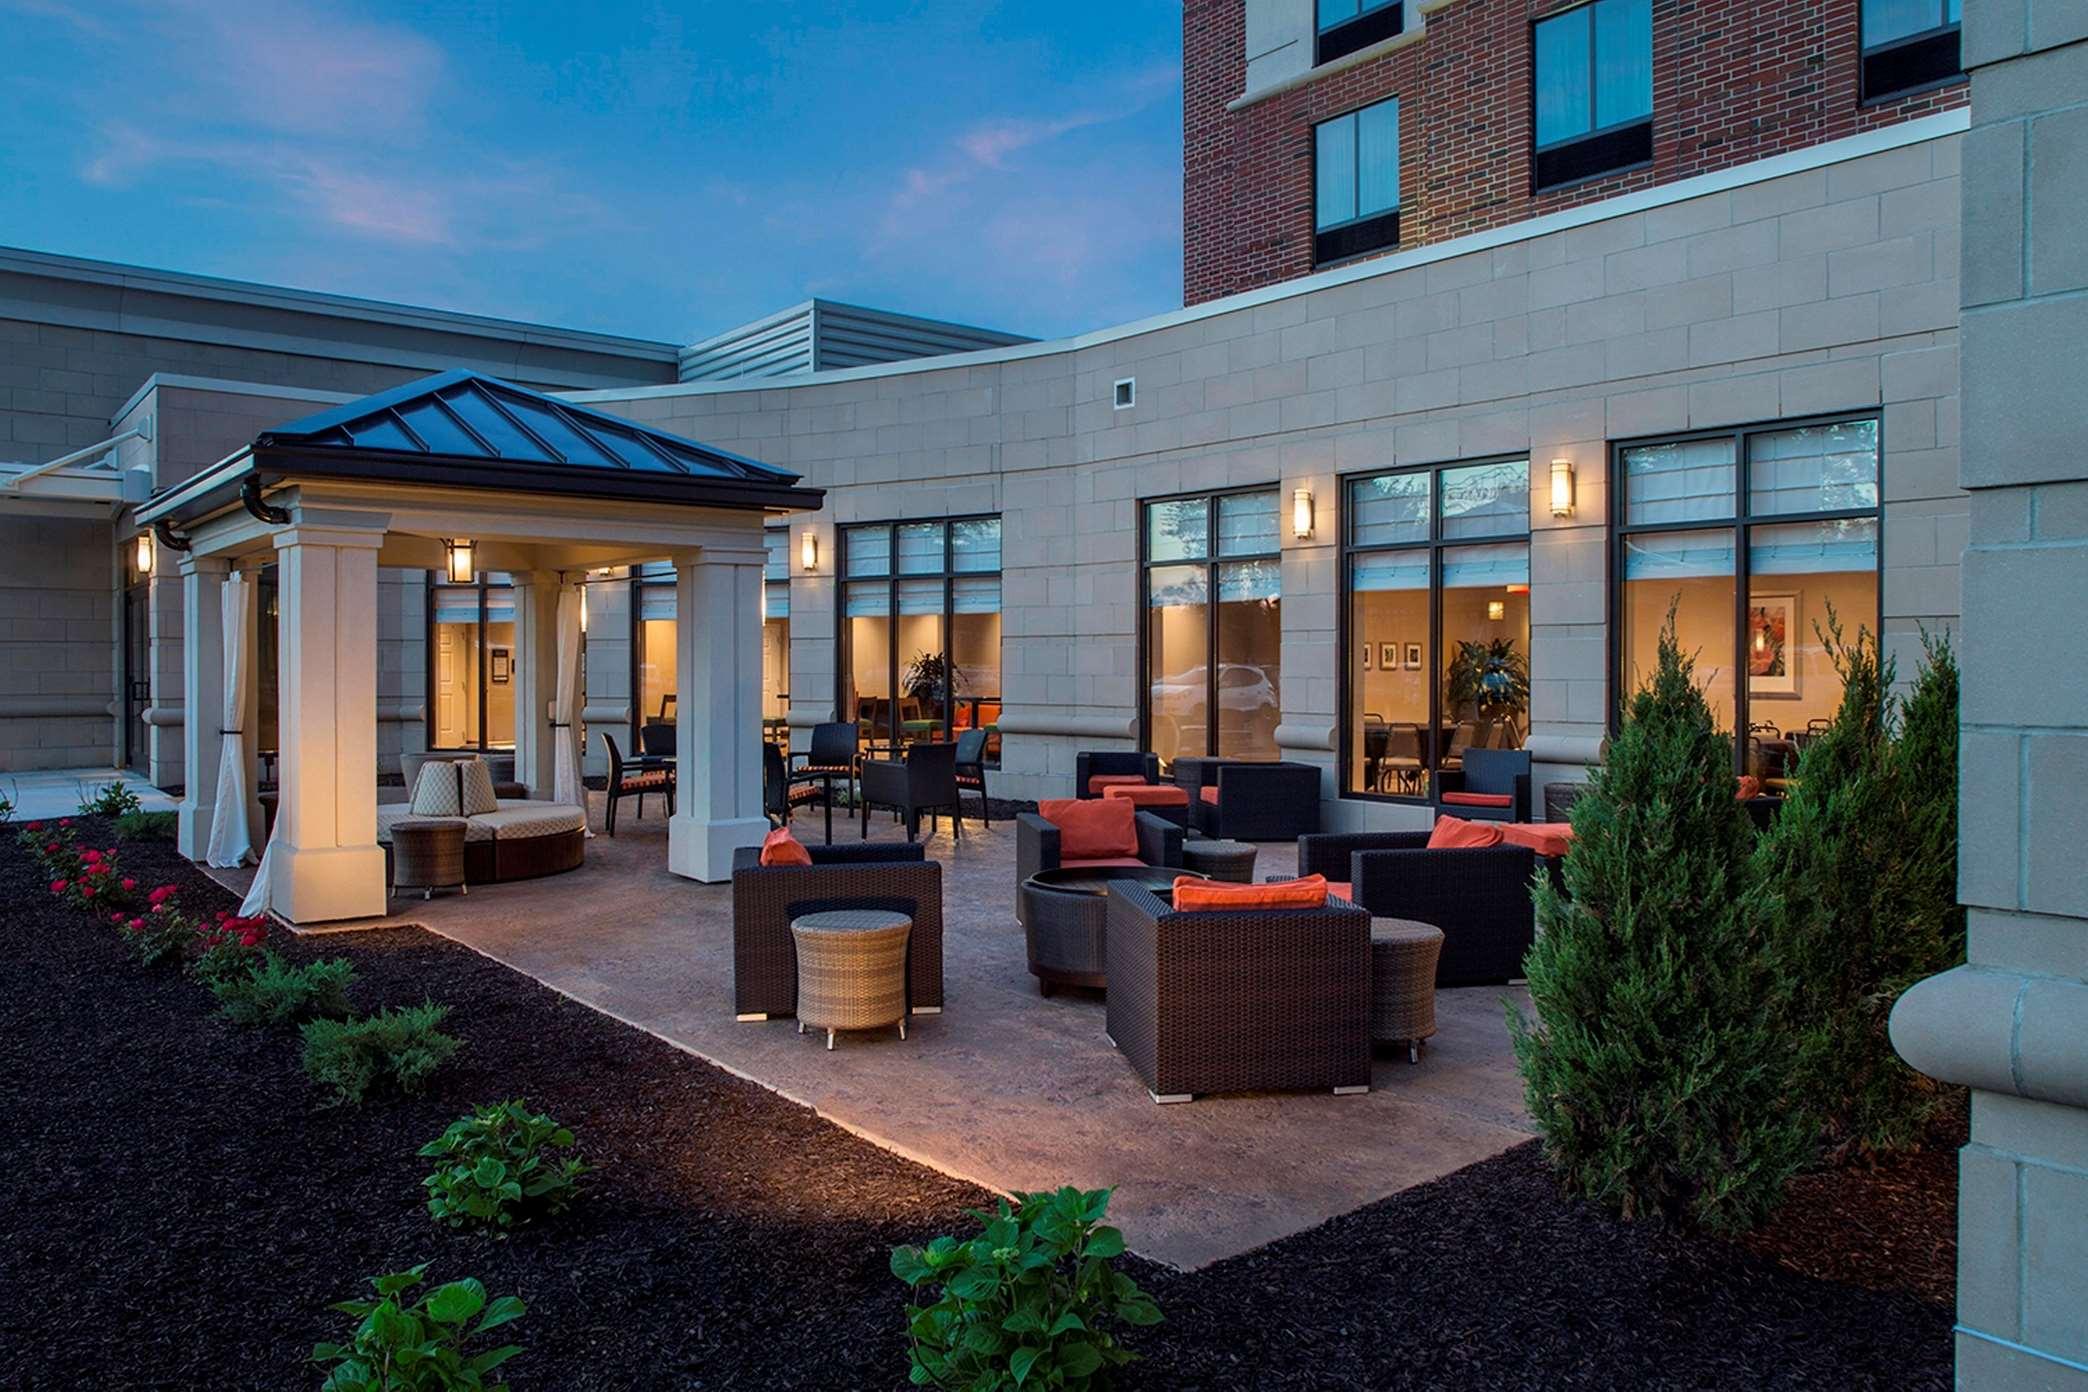 Hilton Garden Inn Akron image 35